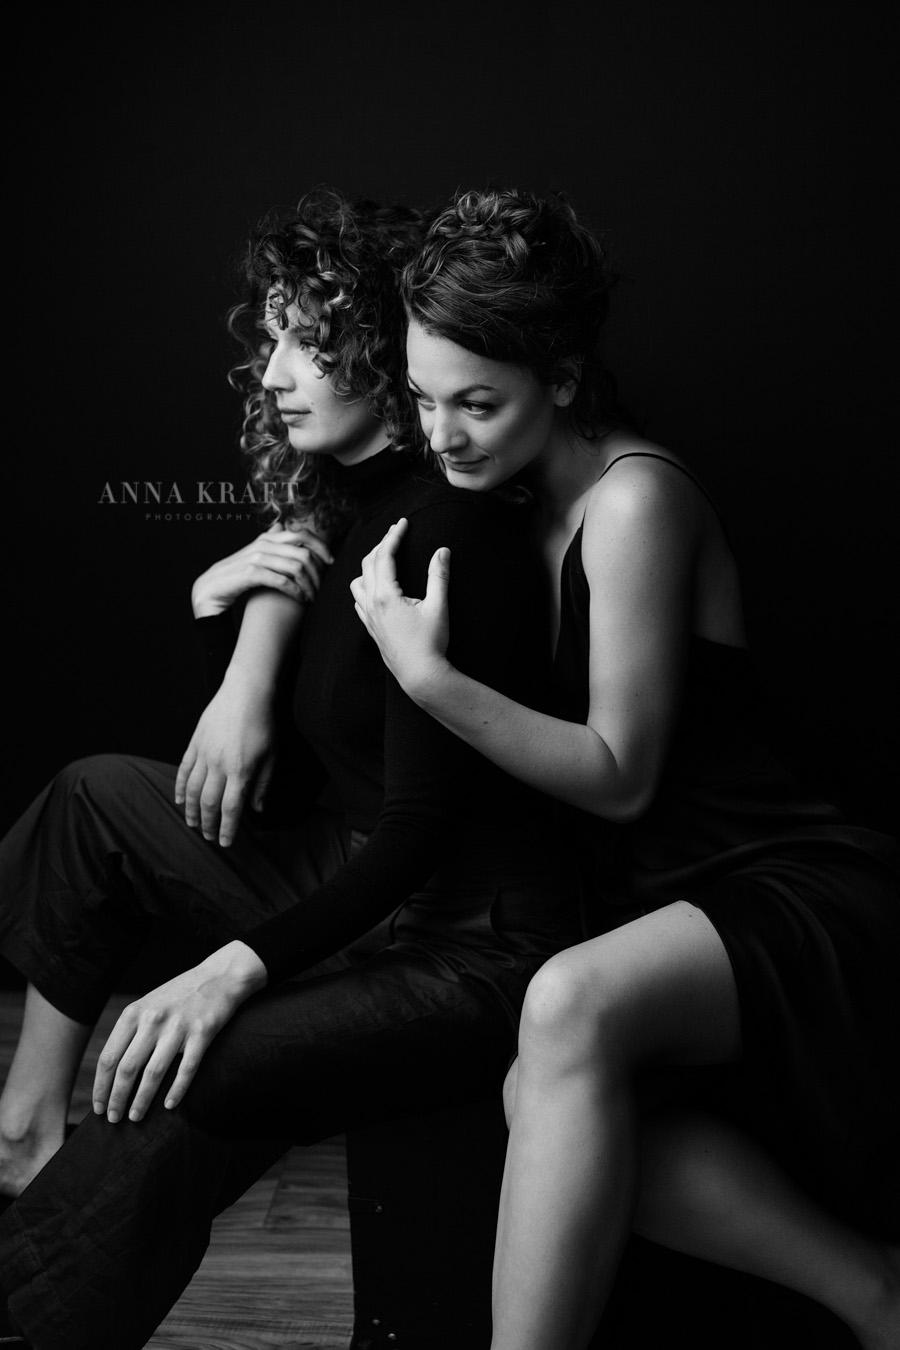 anna_kraft_photography_georgetown_square_studio_family_portrait-14.jpg